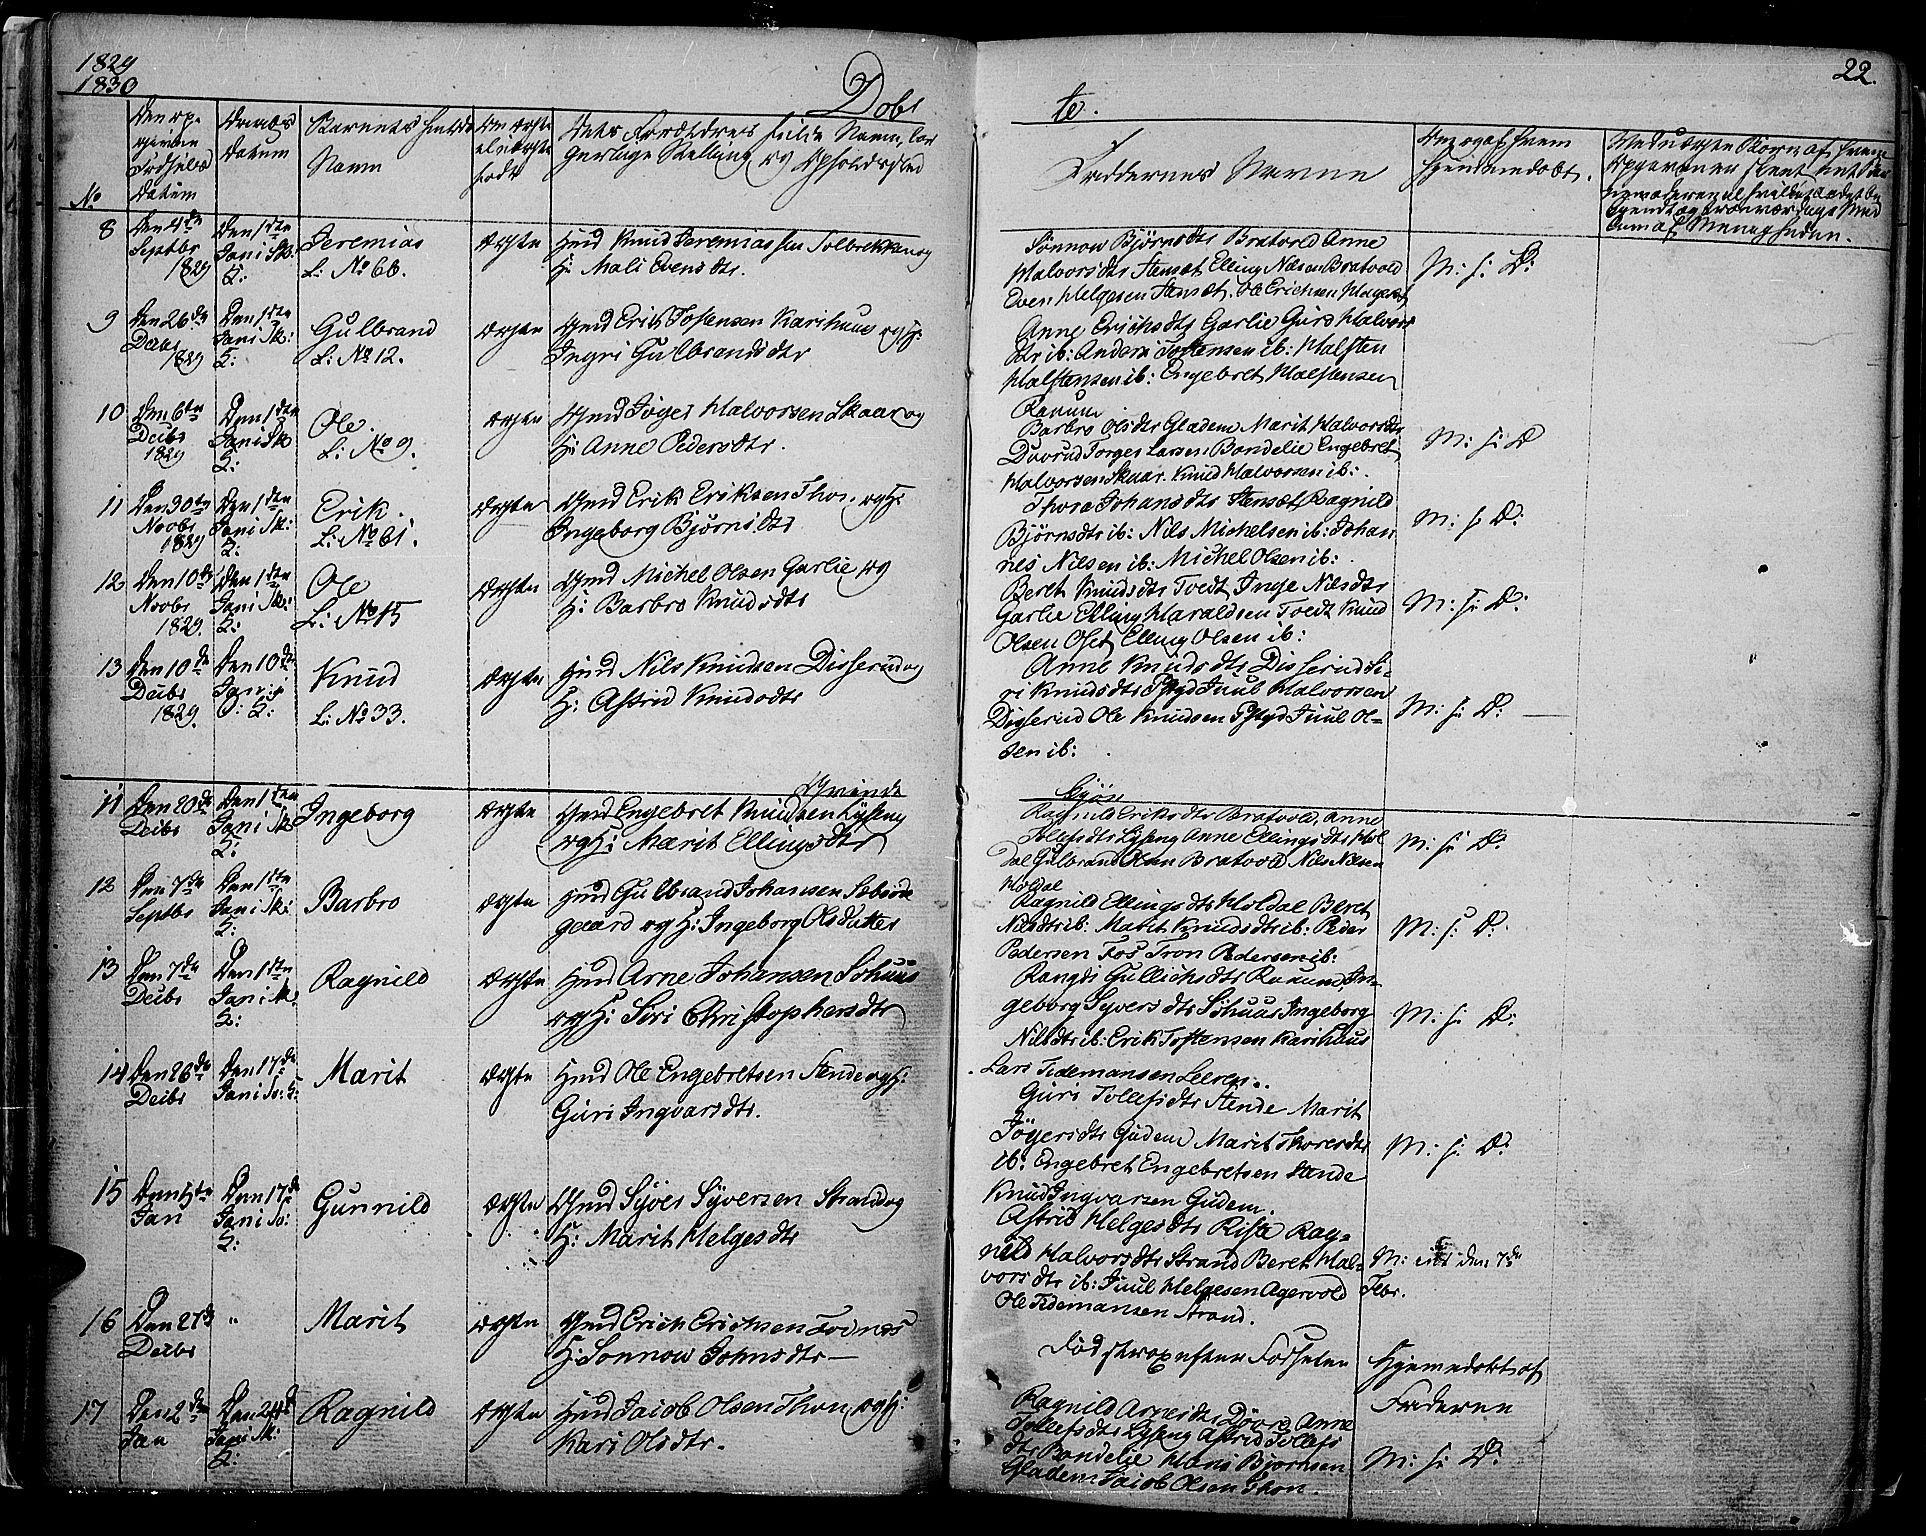 SAH, Nord-Aurdal prestekontor, Ministerialbok nr. 3, 1828-1841, s. 22